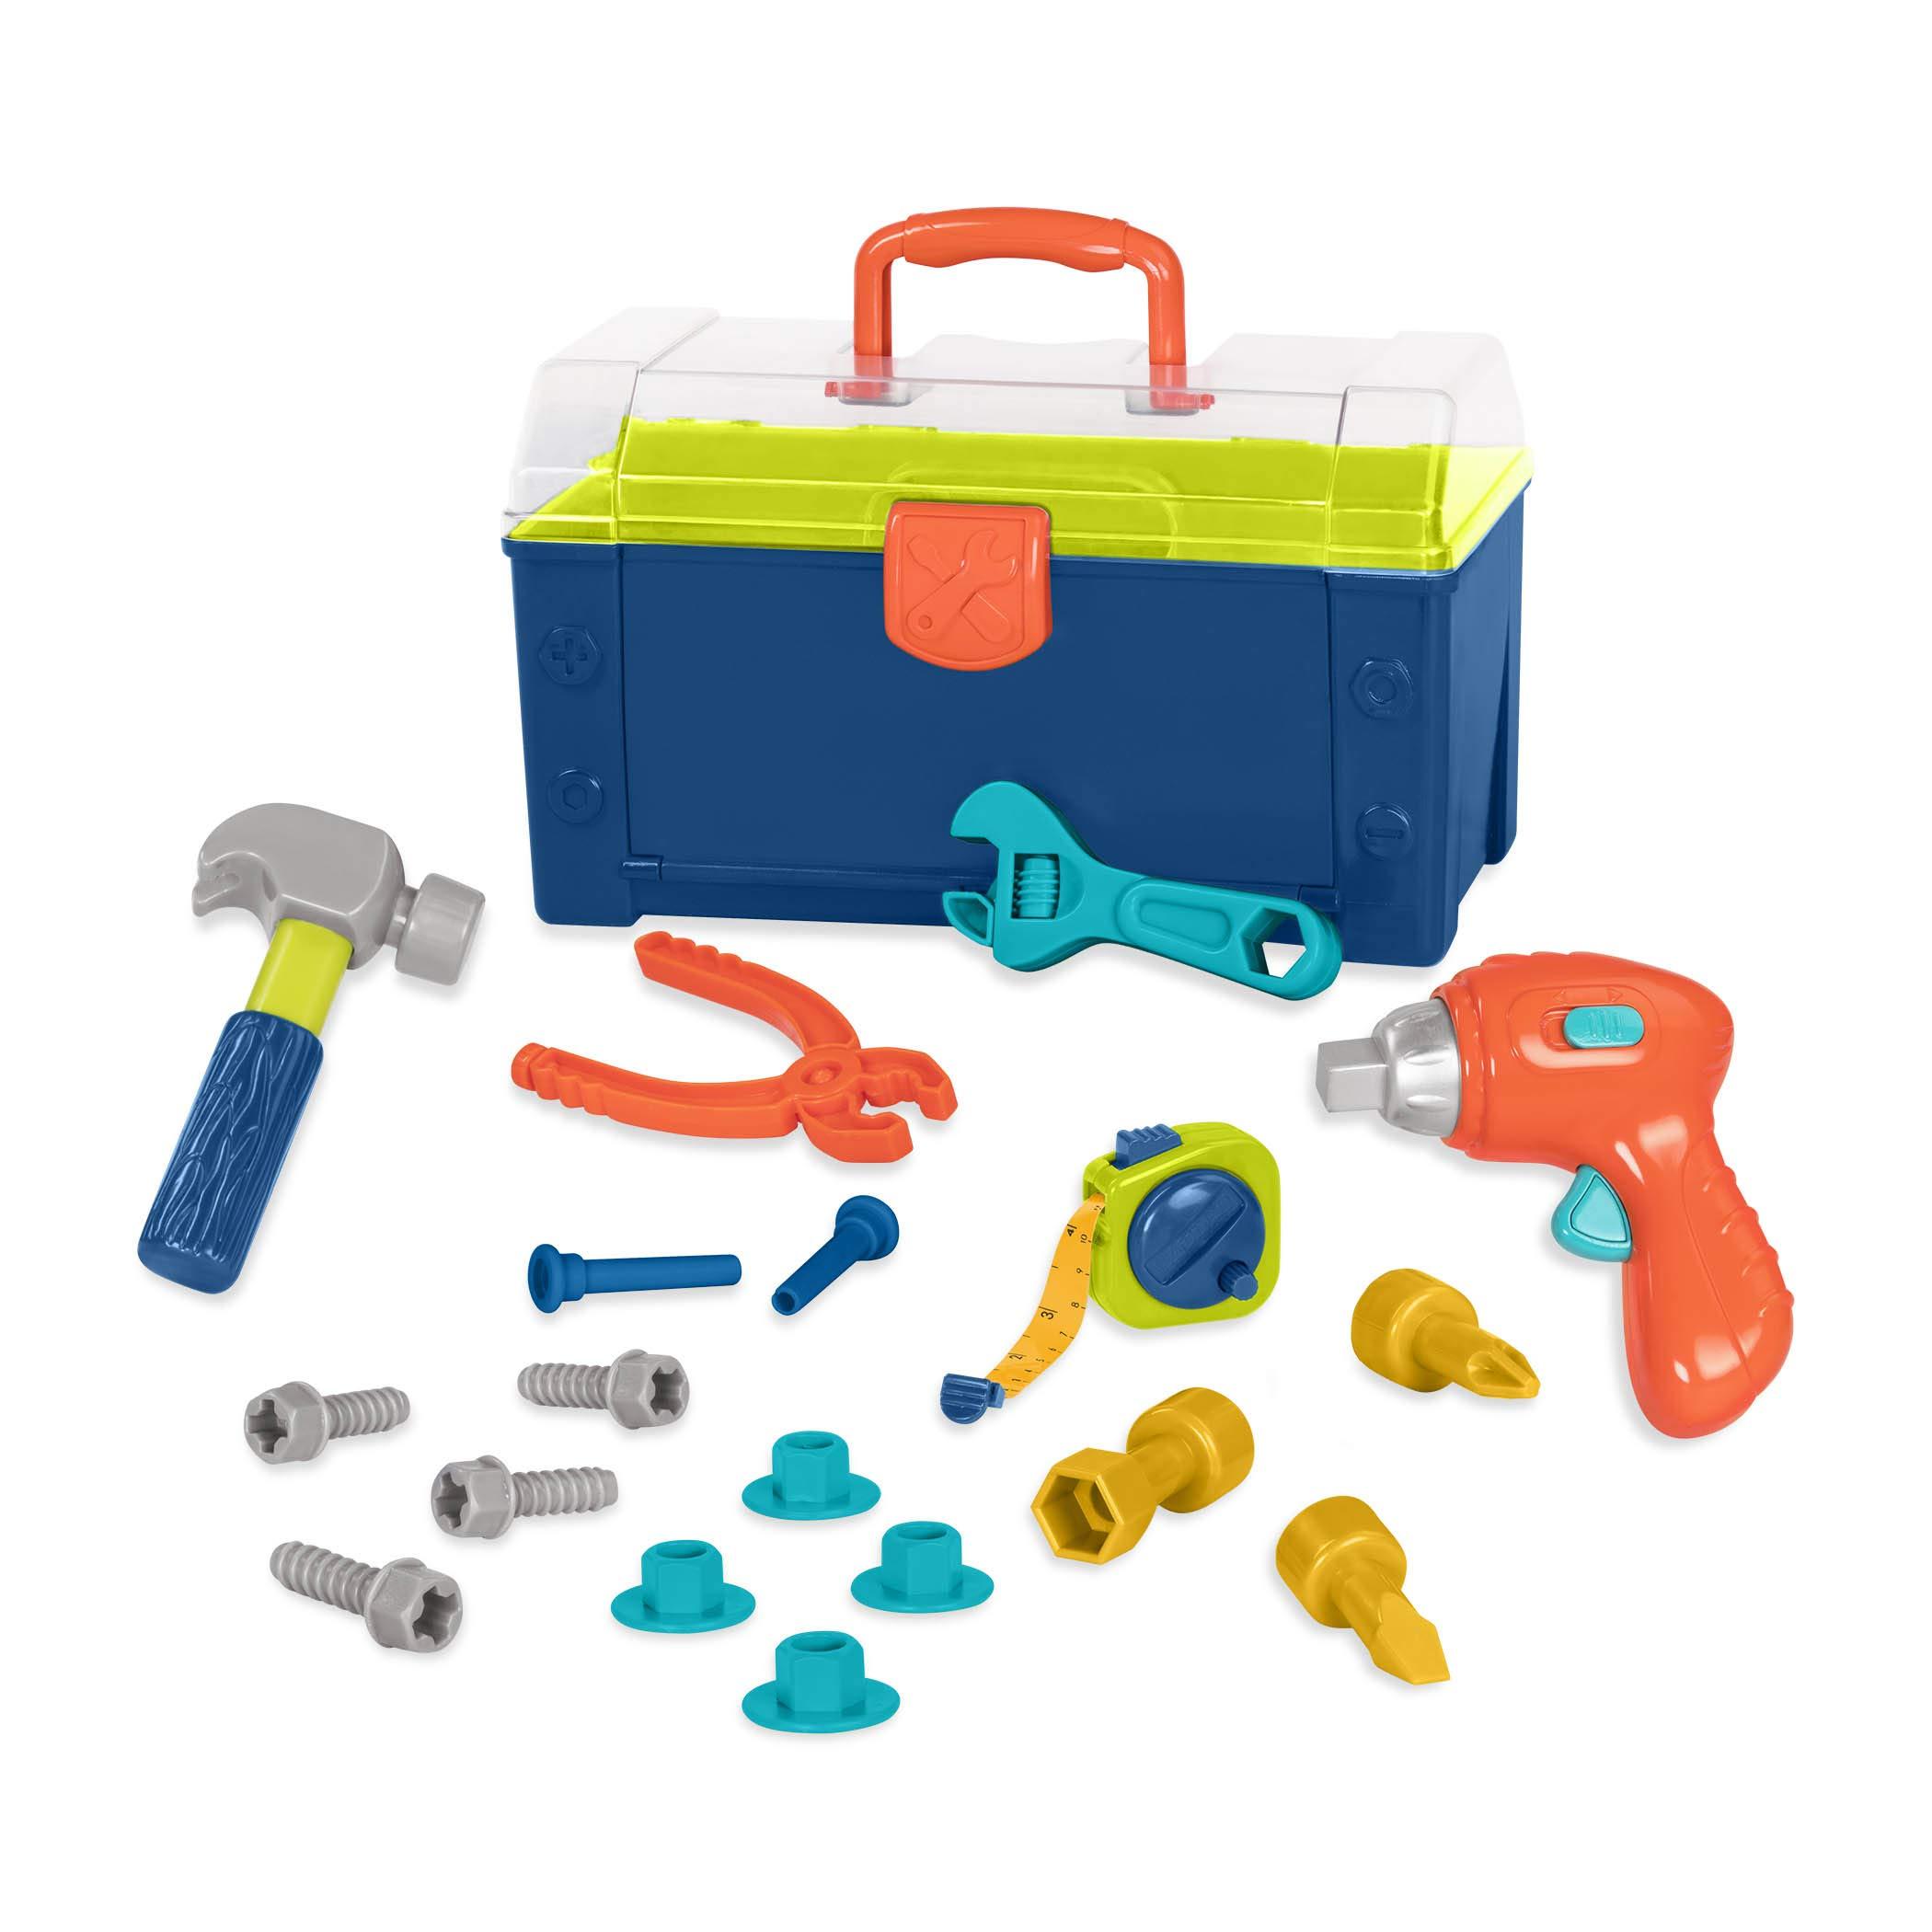 Battat - Battat Busy Builder Tool Box - Durable Kids Tool Set - Pretend Play Construction Tool Kit for Kids 3 years+  (20-Pcs) by Battat